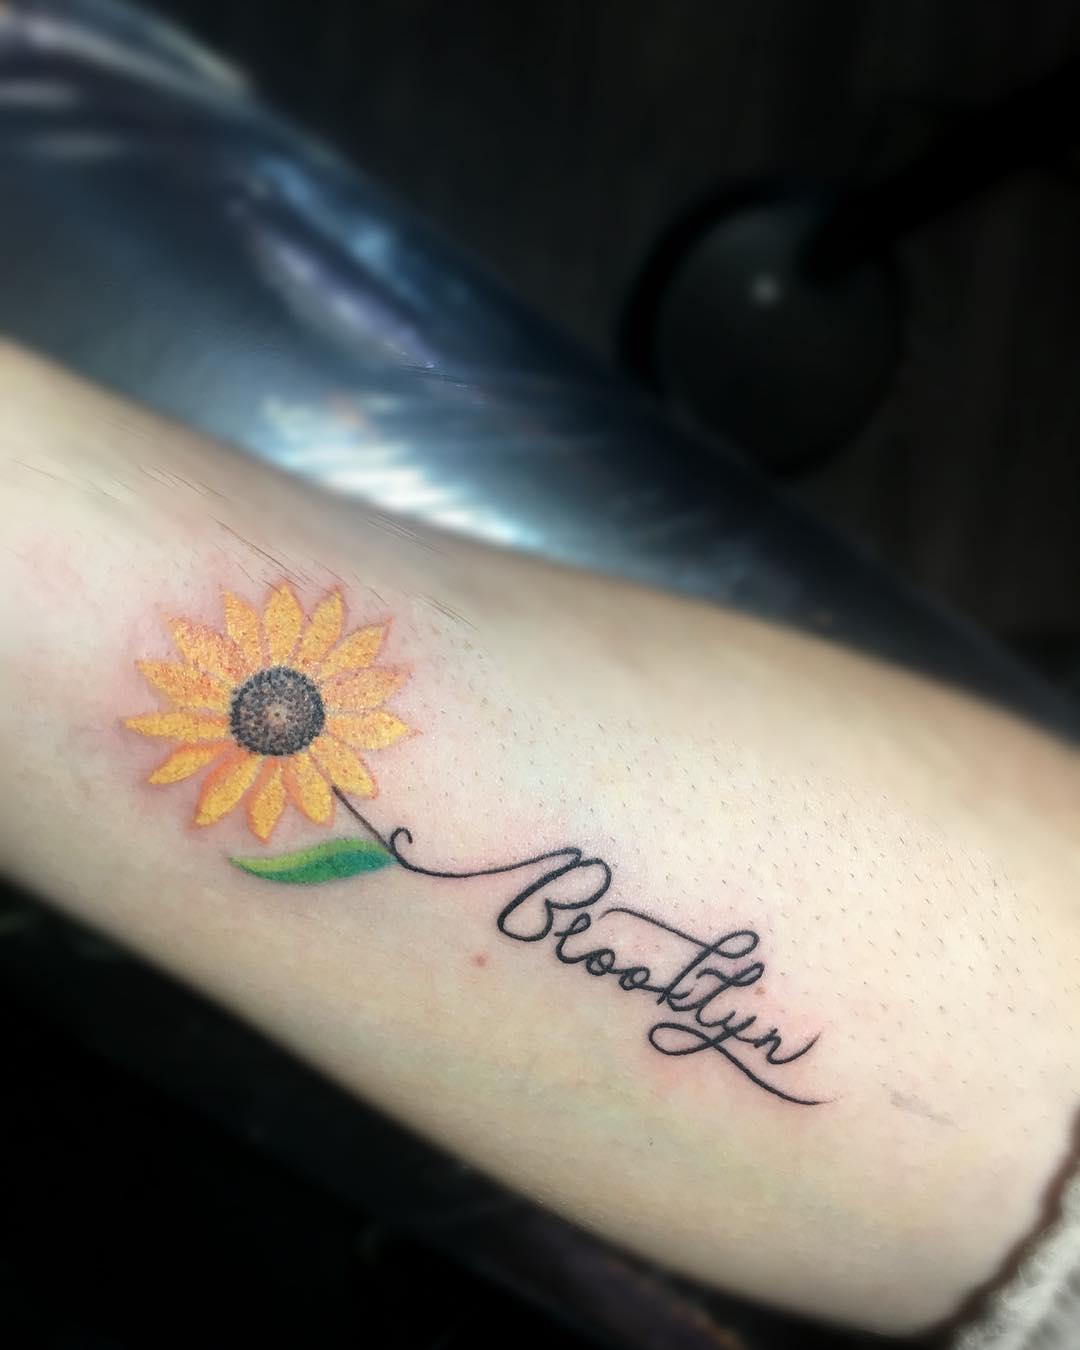 Inspiring sunflower tattoo image